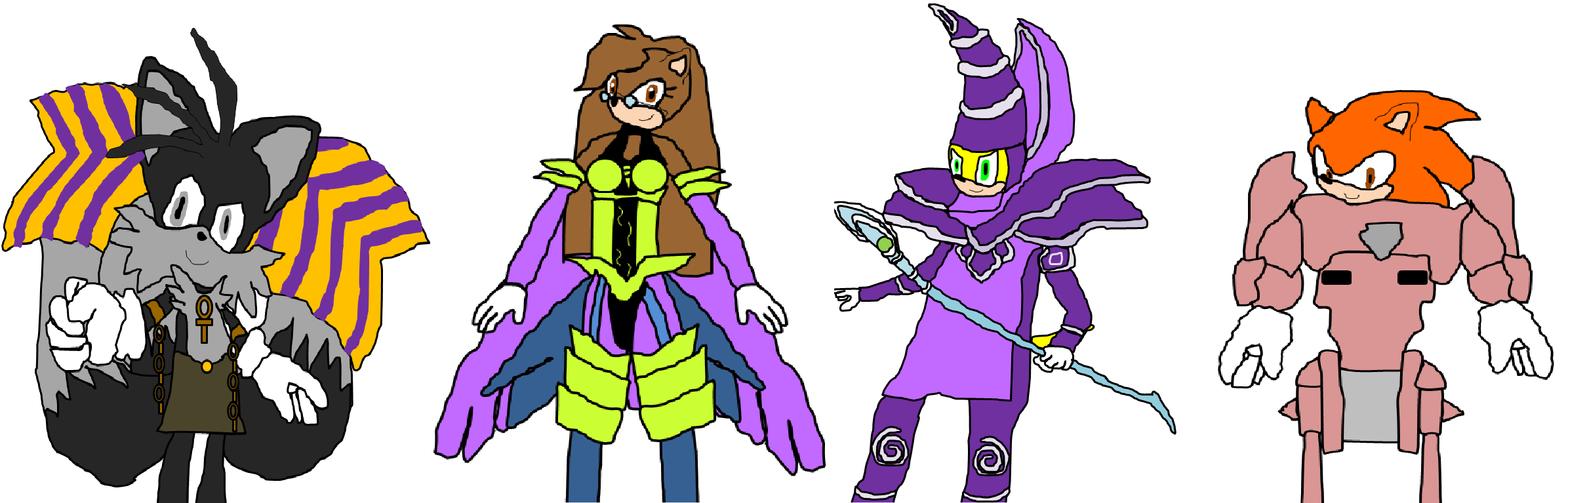 Angus and friends (Yu-Gi-Oh cosplay) by Amazingangus76